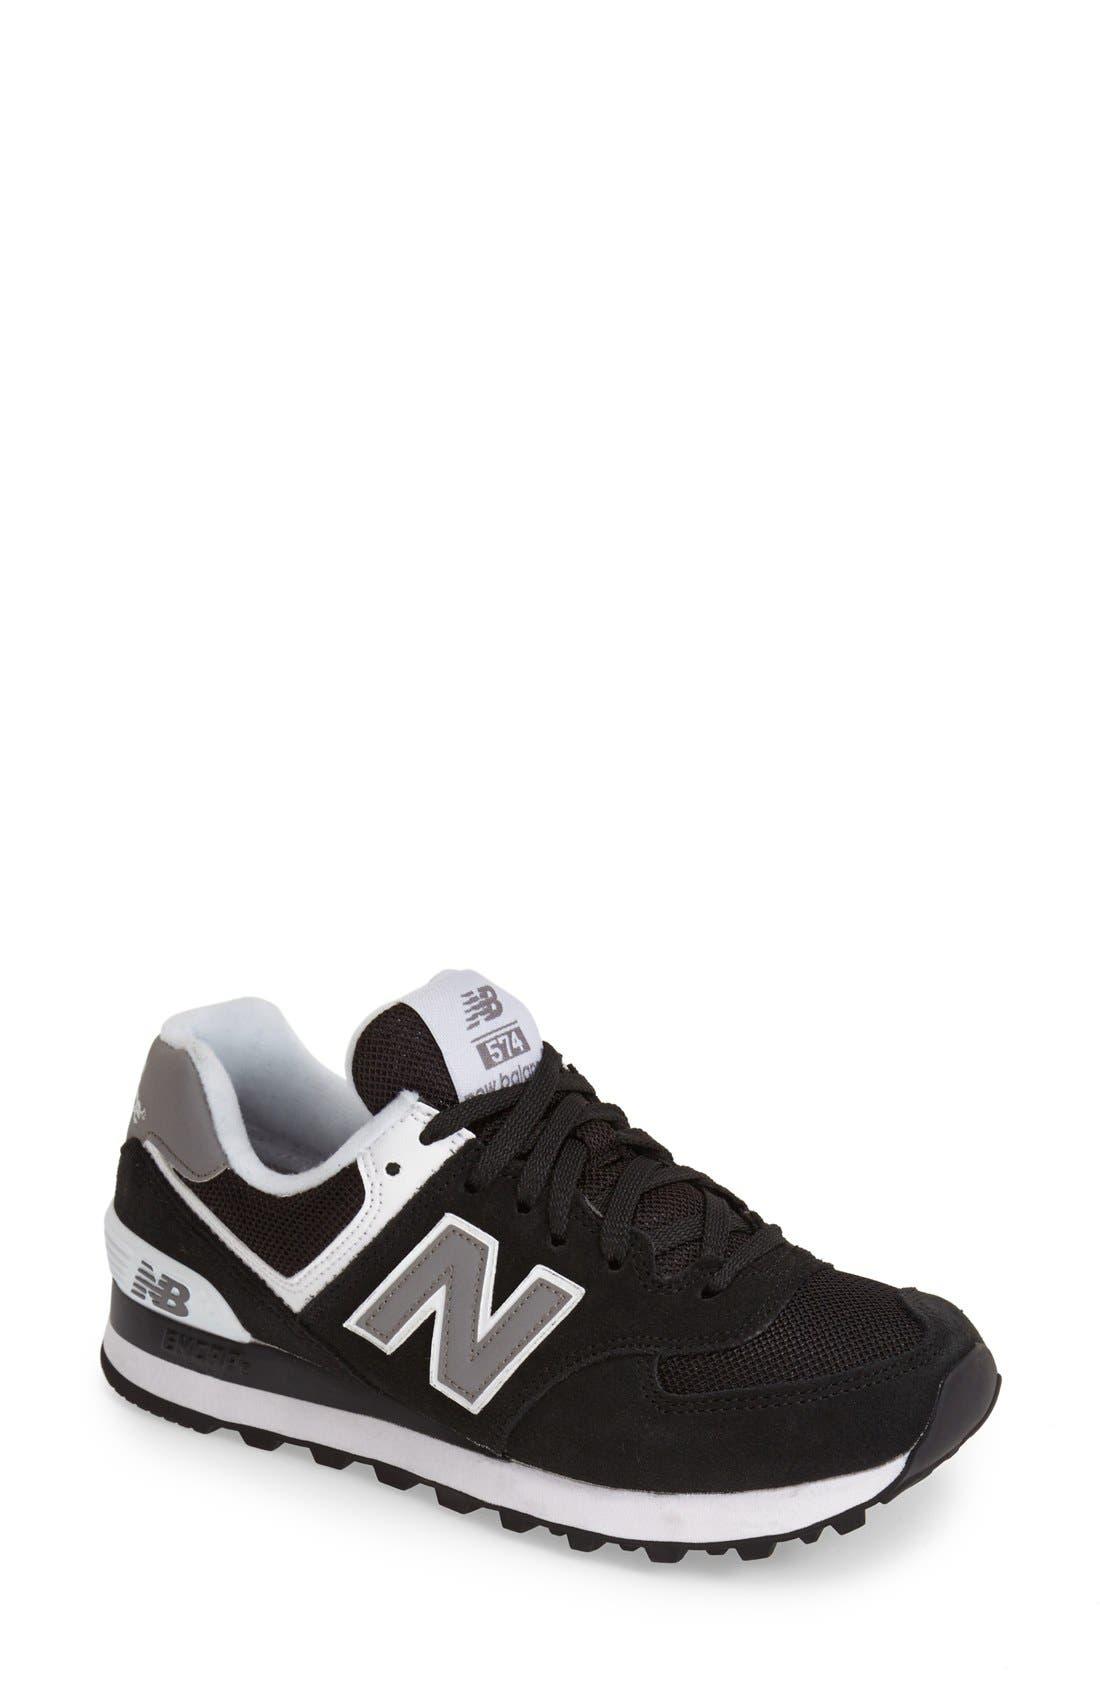 Alternate Image 1 Selected - New Balance '574 Classic' Sneaker (Women)